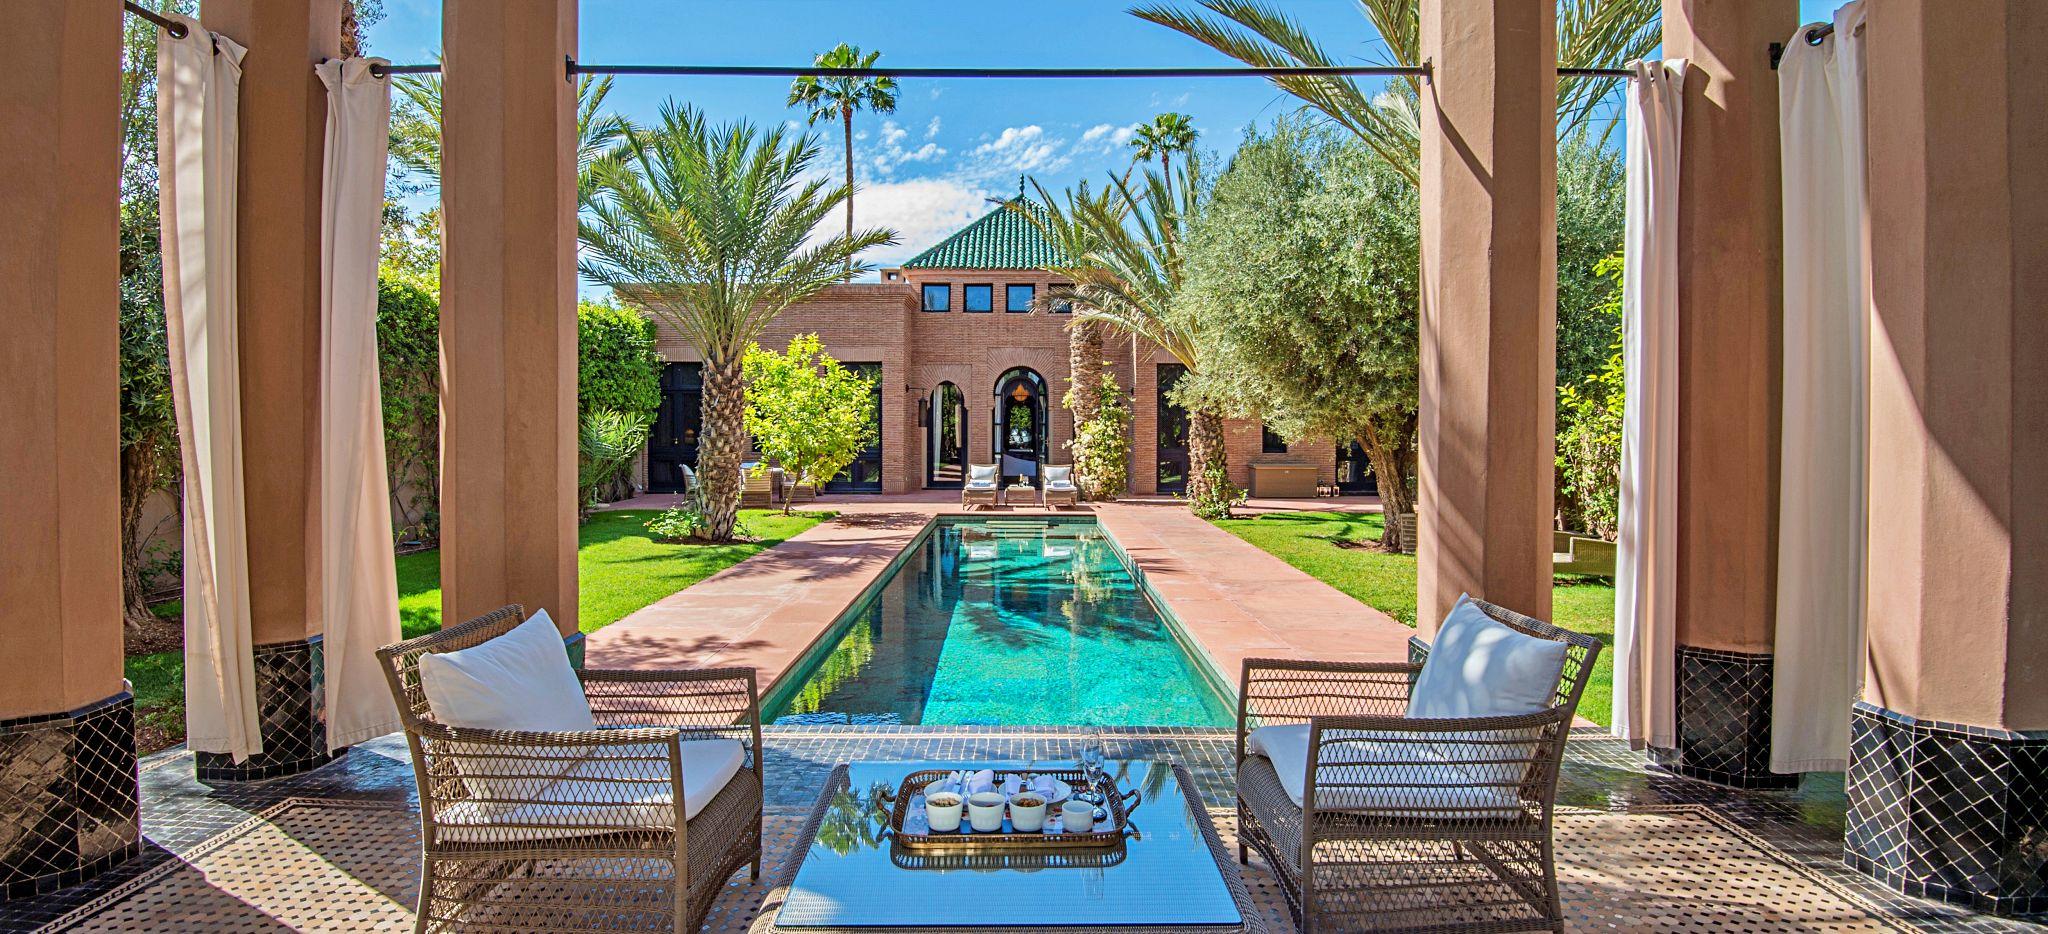 Privater Pool einer Villa, Hotel Selman, Marokko